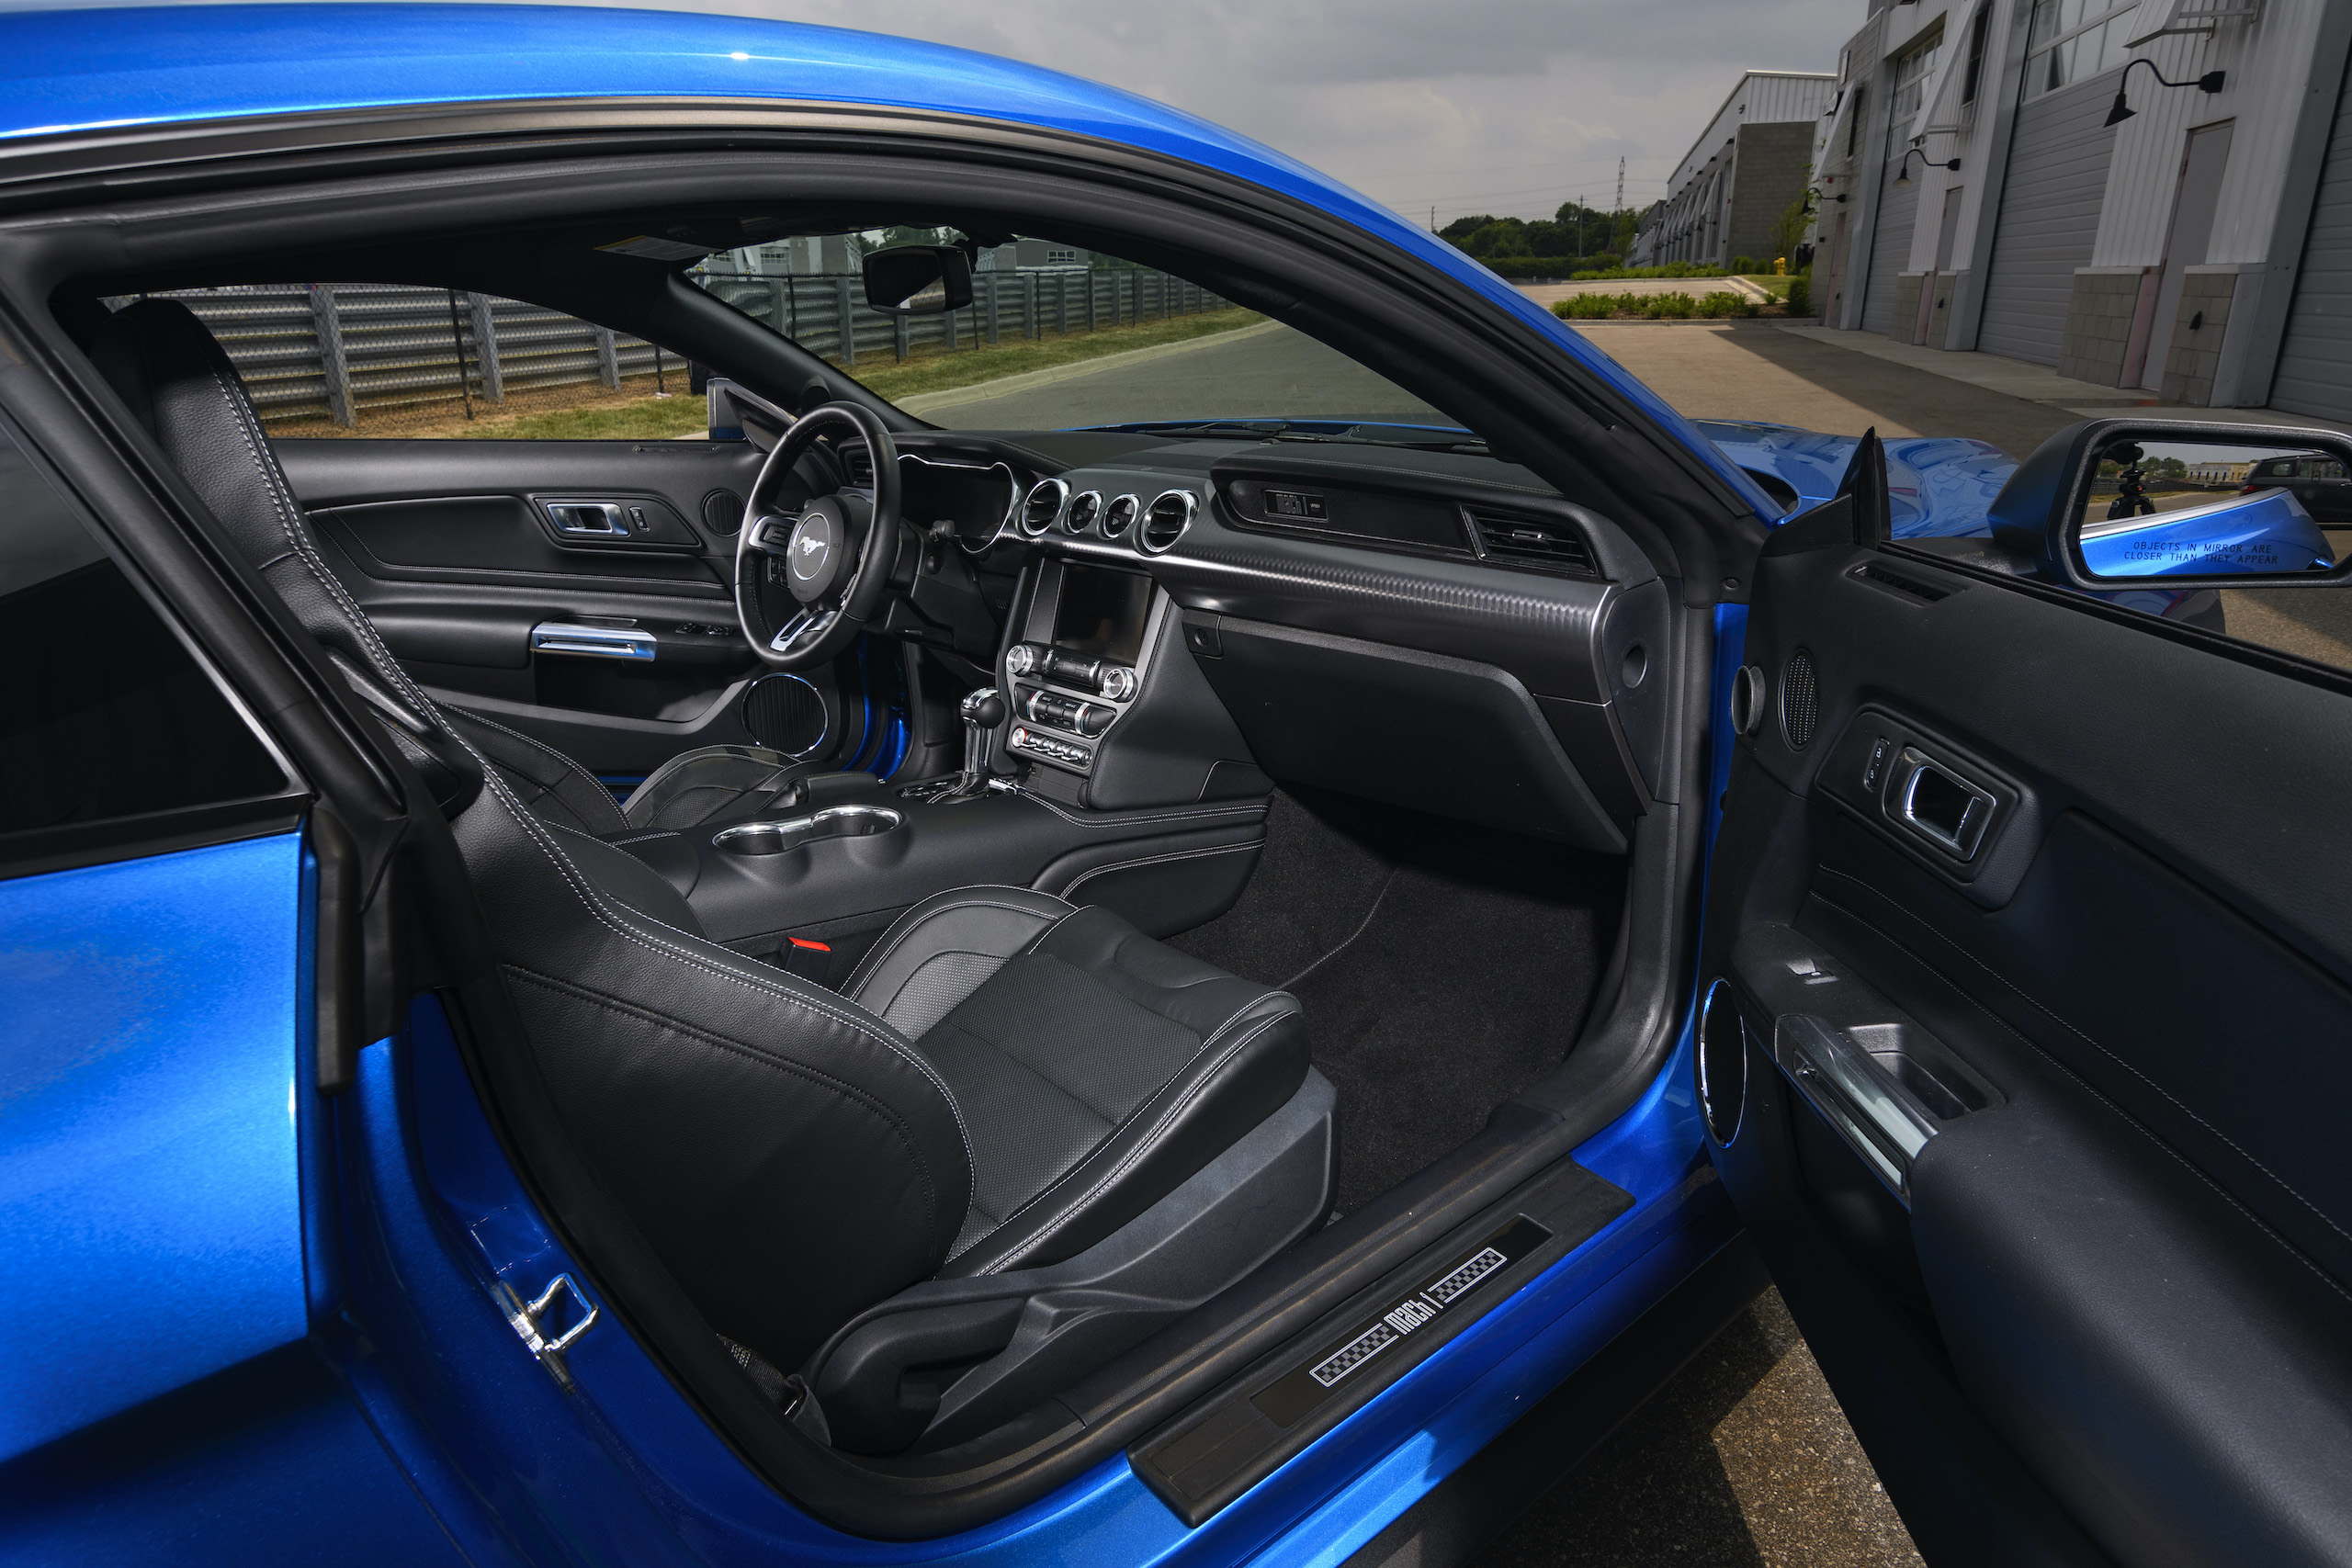 2021 Mustang Mach 1 blue interior passenger side